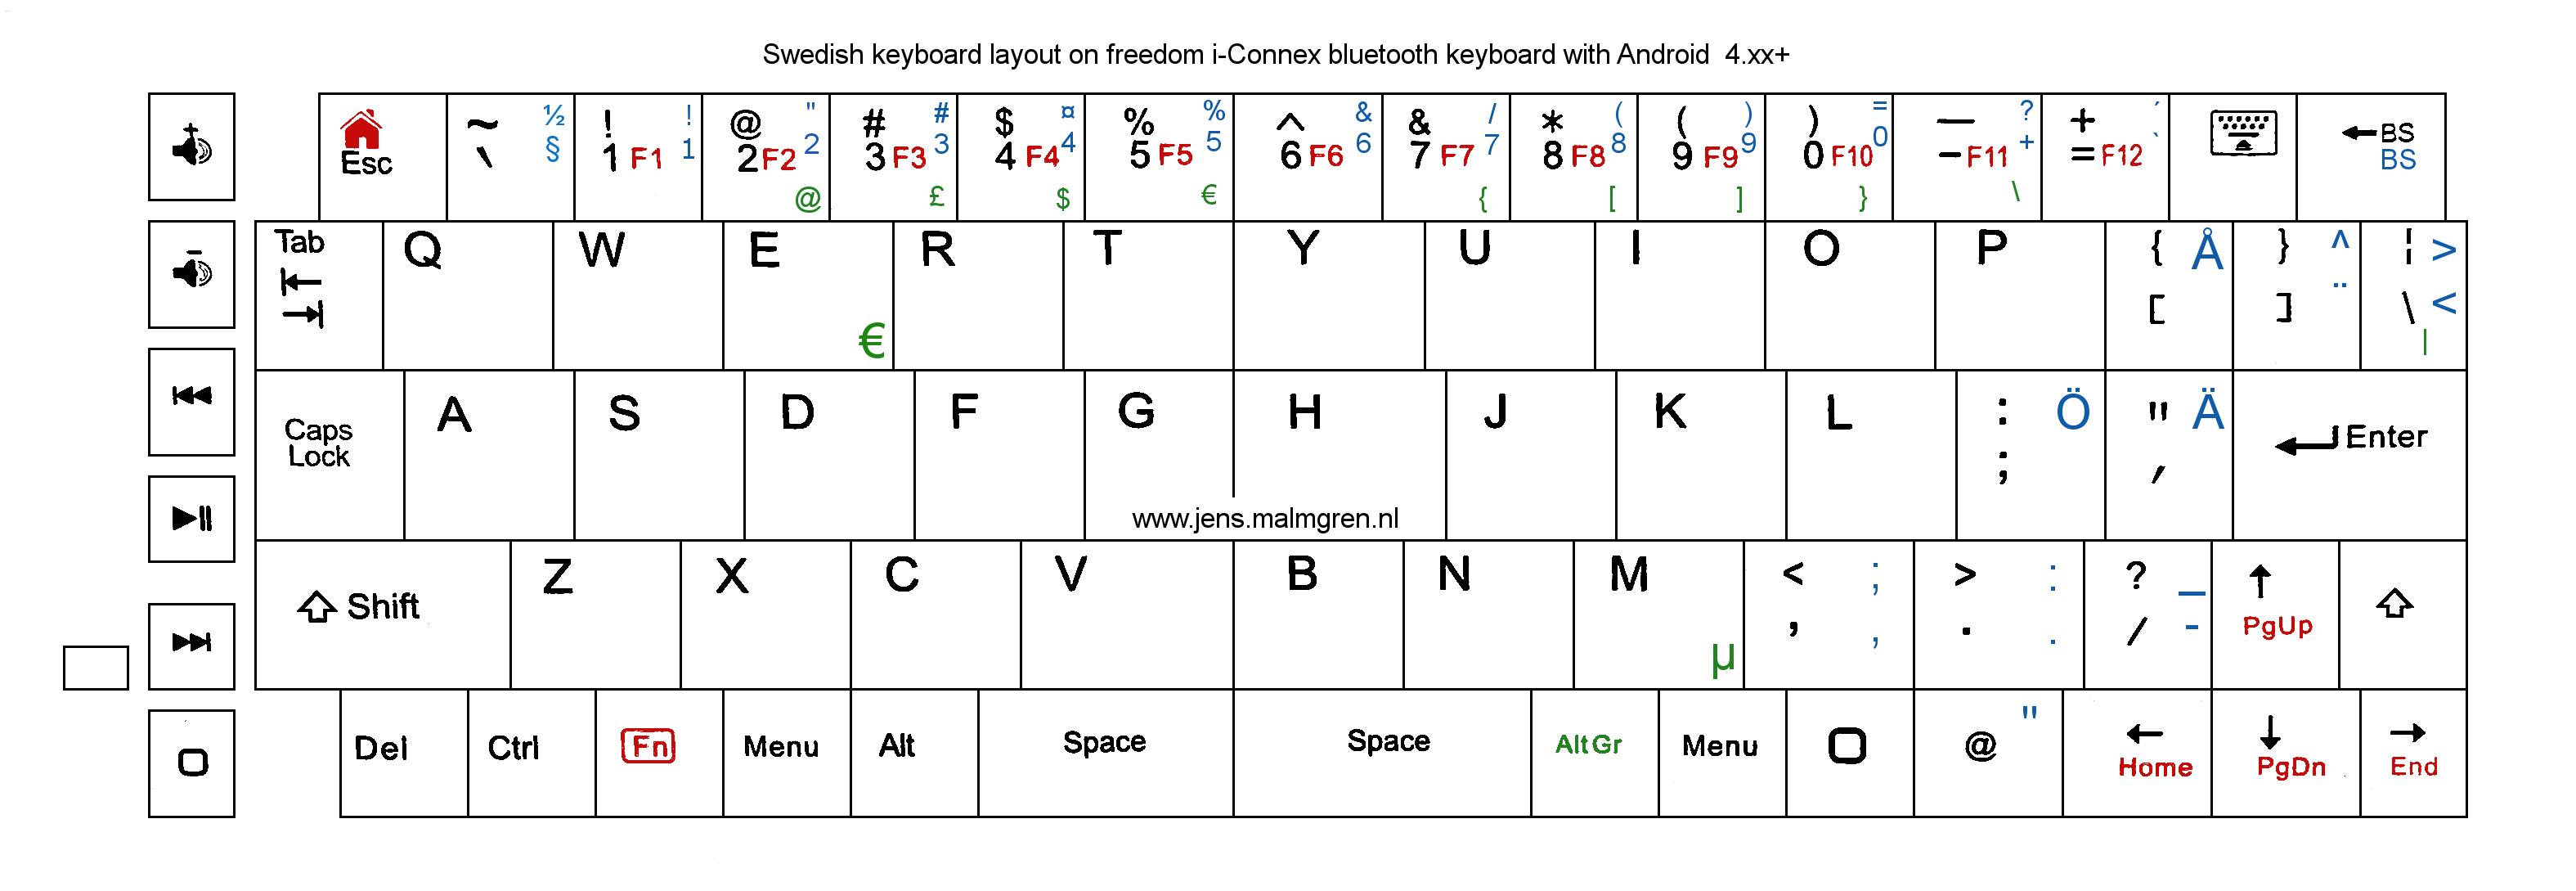 Swedish Keyboard Layout On An US IConnex Bluetooth Keyboard - Us keyboard map name